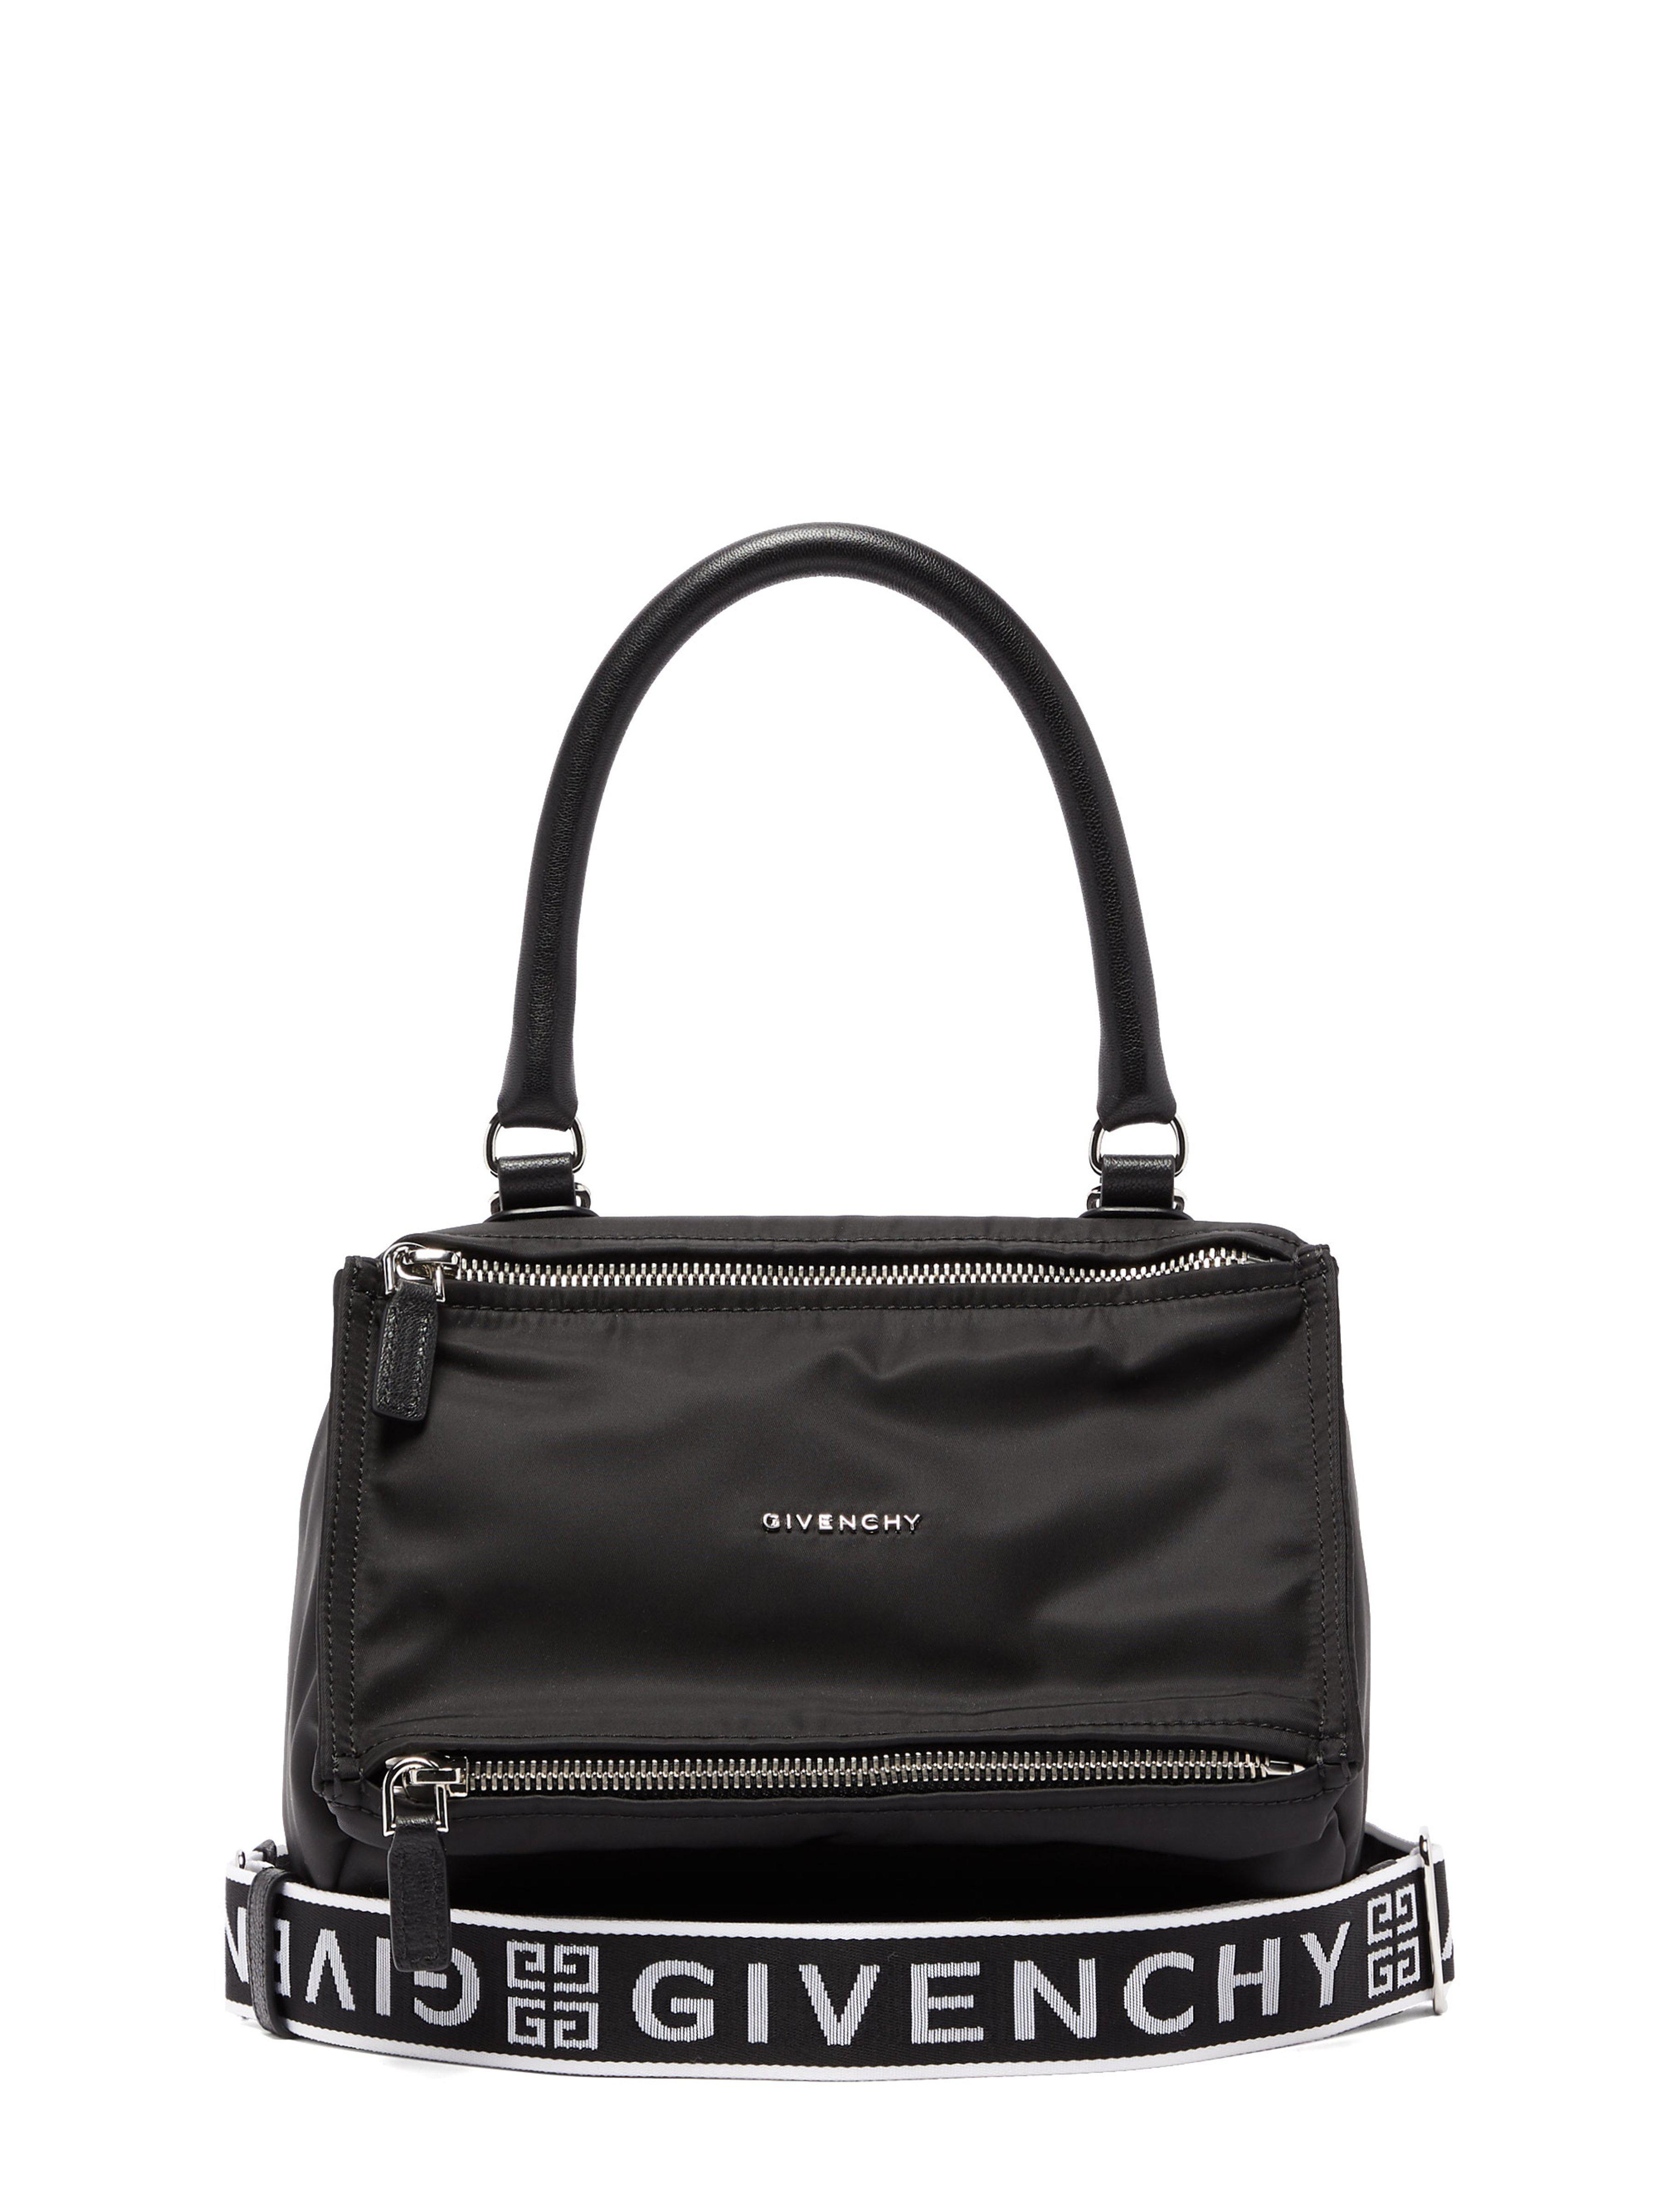 cdc268c281 ... Givenchy - Black Pandora Nylon Bag - Lyst. Visit MATCHESFASHION.COM.  Tap to visit site